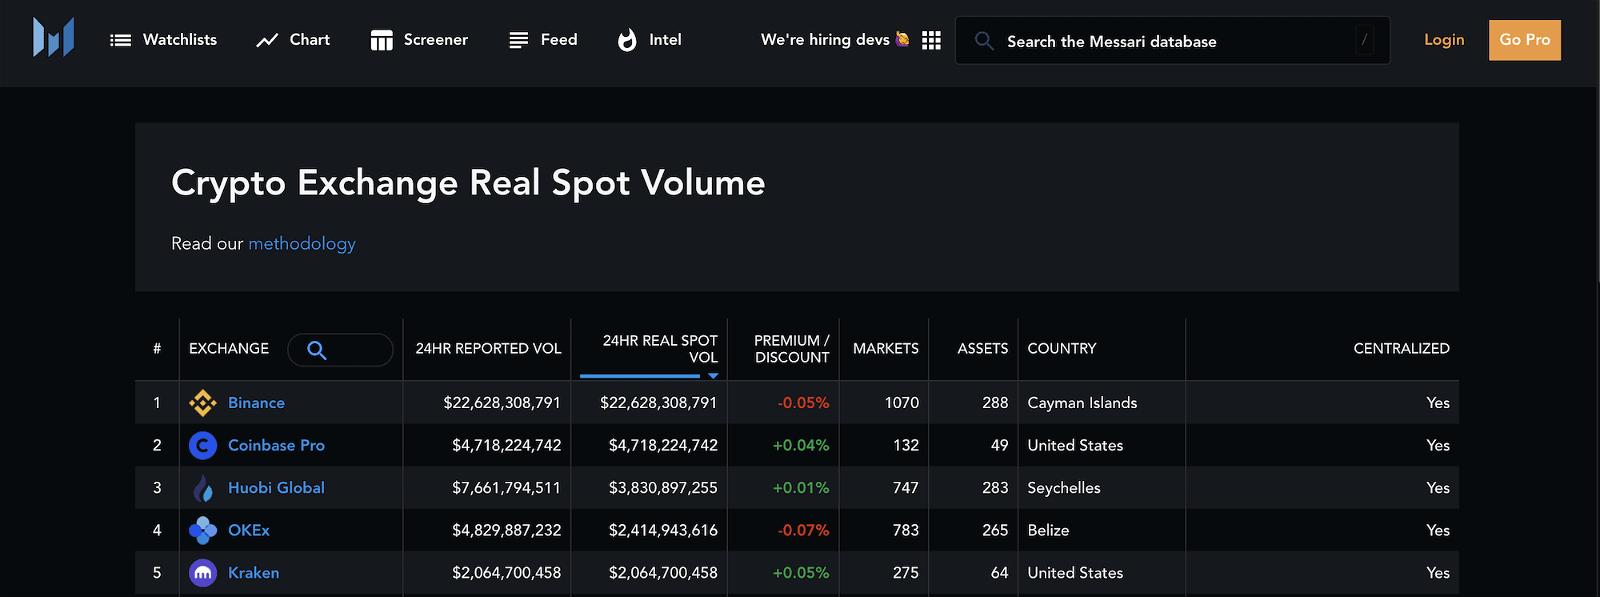 cryptocurrency trading uk bitcoin profitul este real